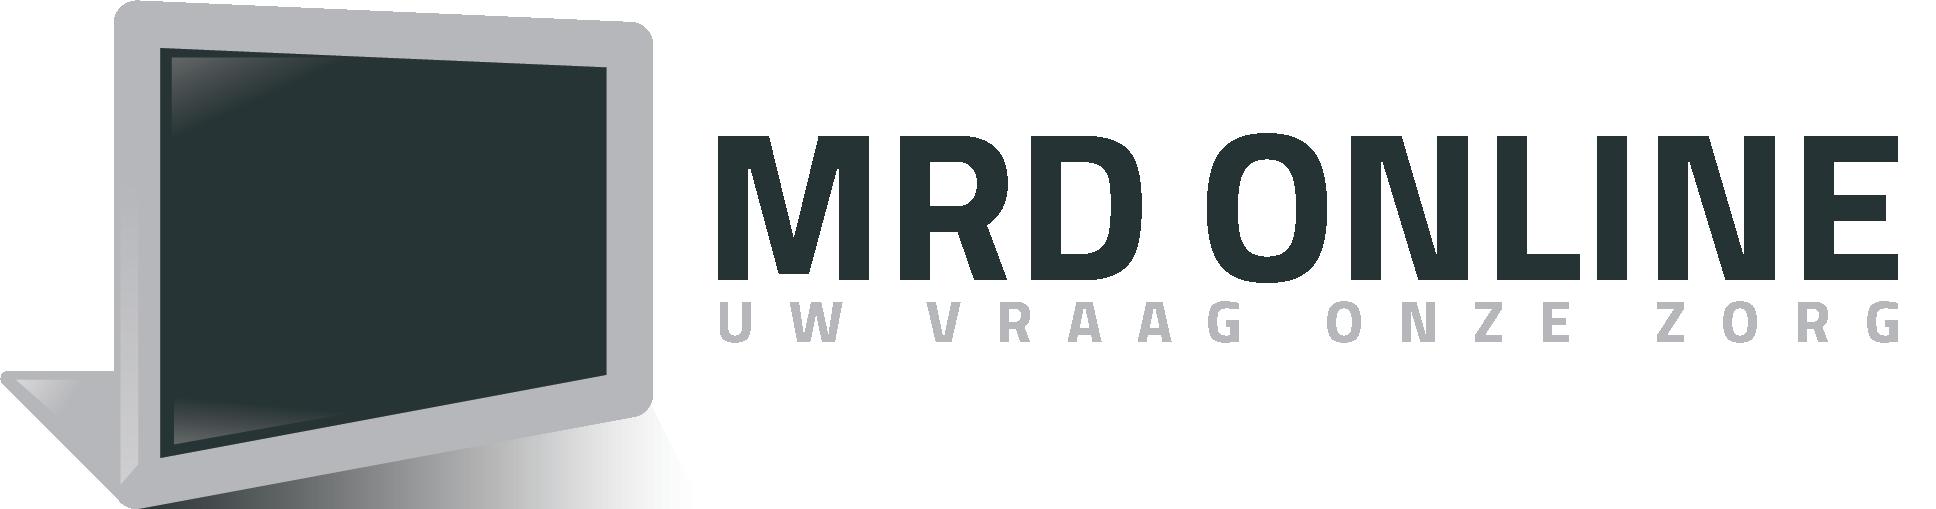 MRD Online